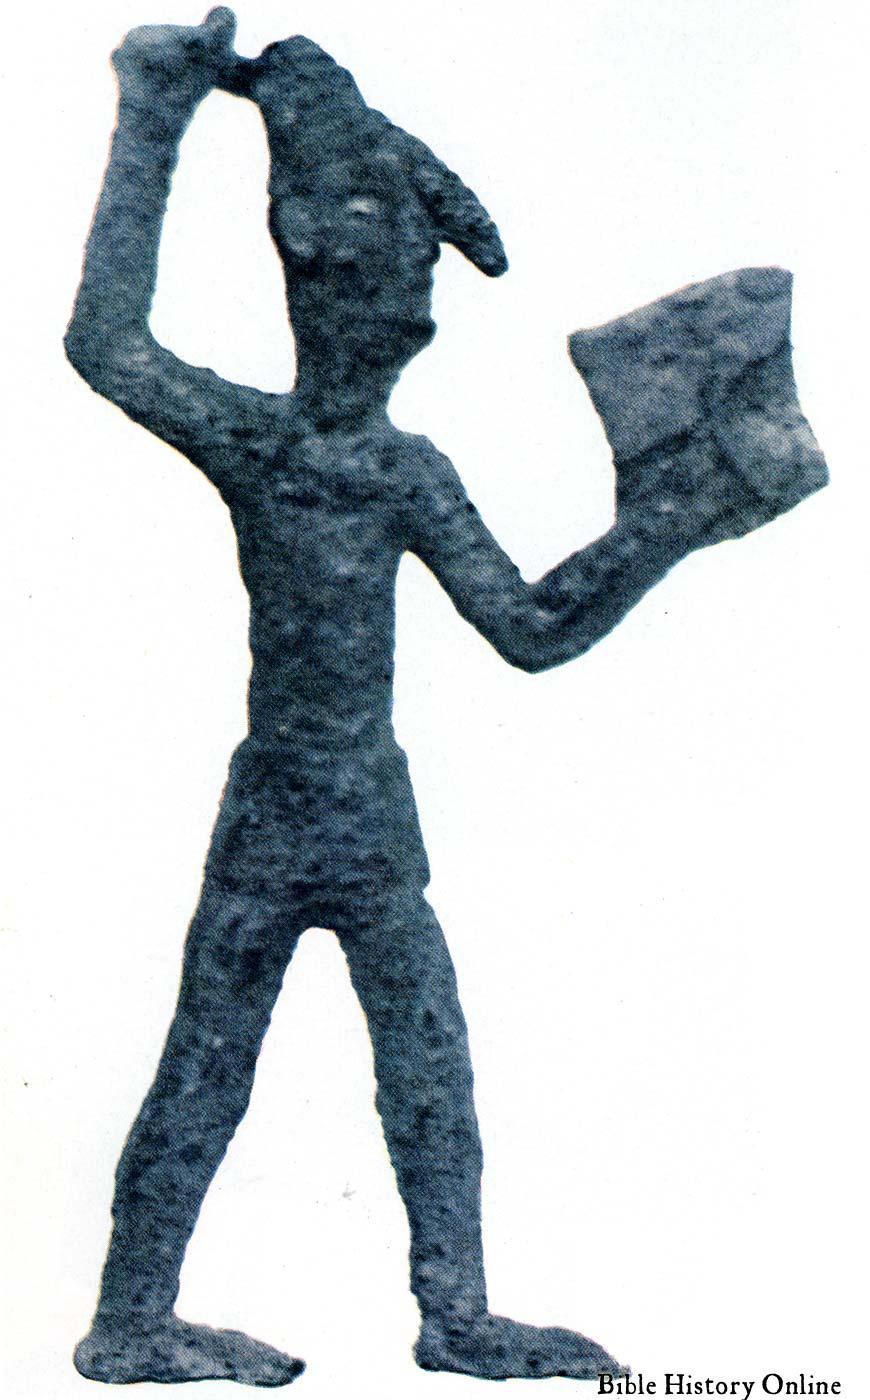 Drawn shield god is Sword Canaanite Drawn God Images